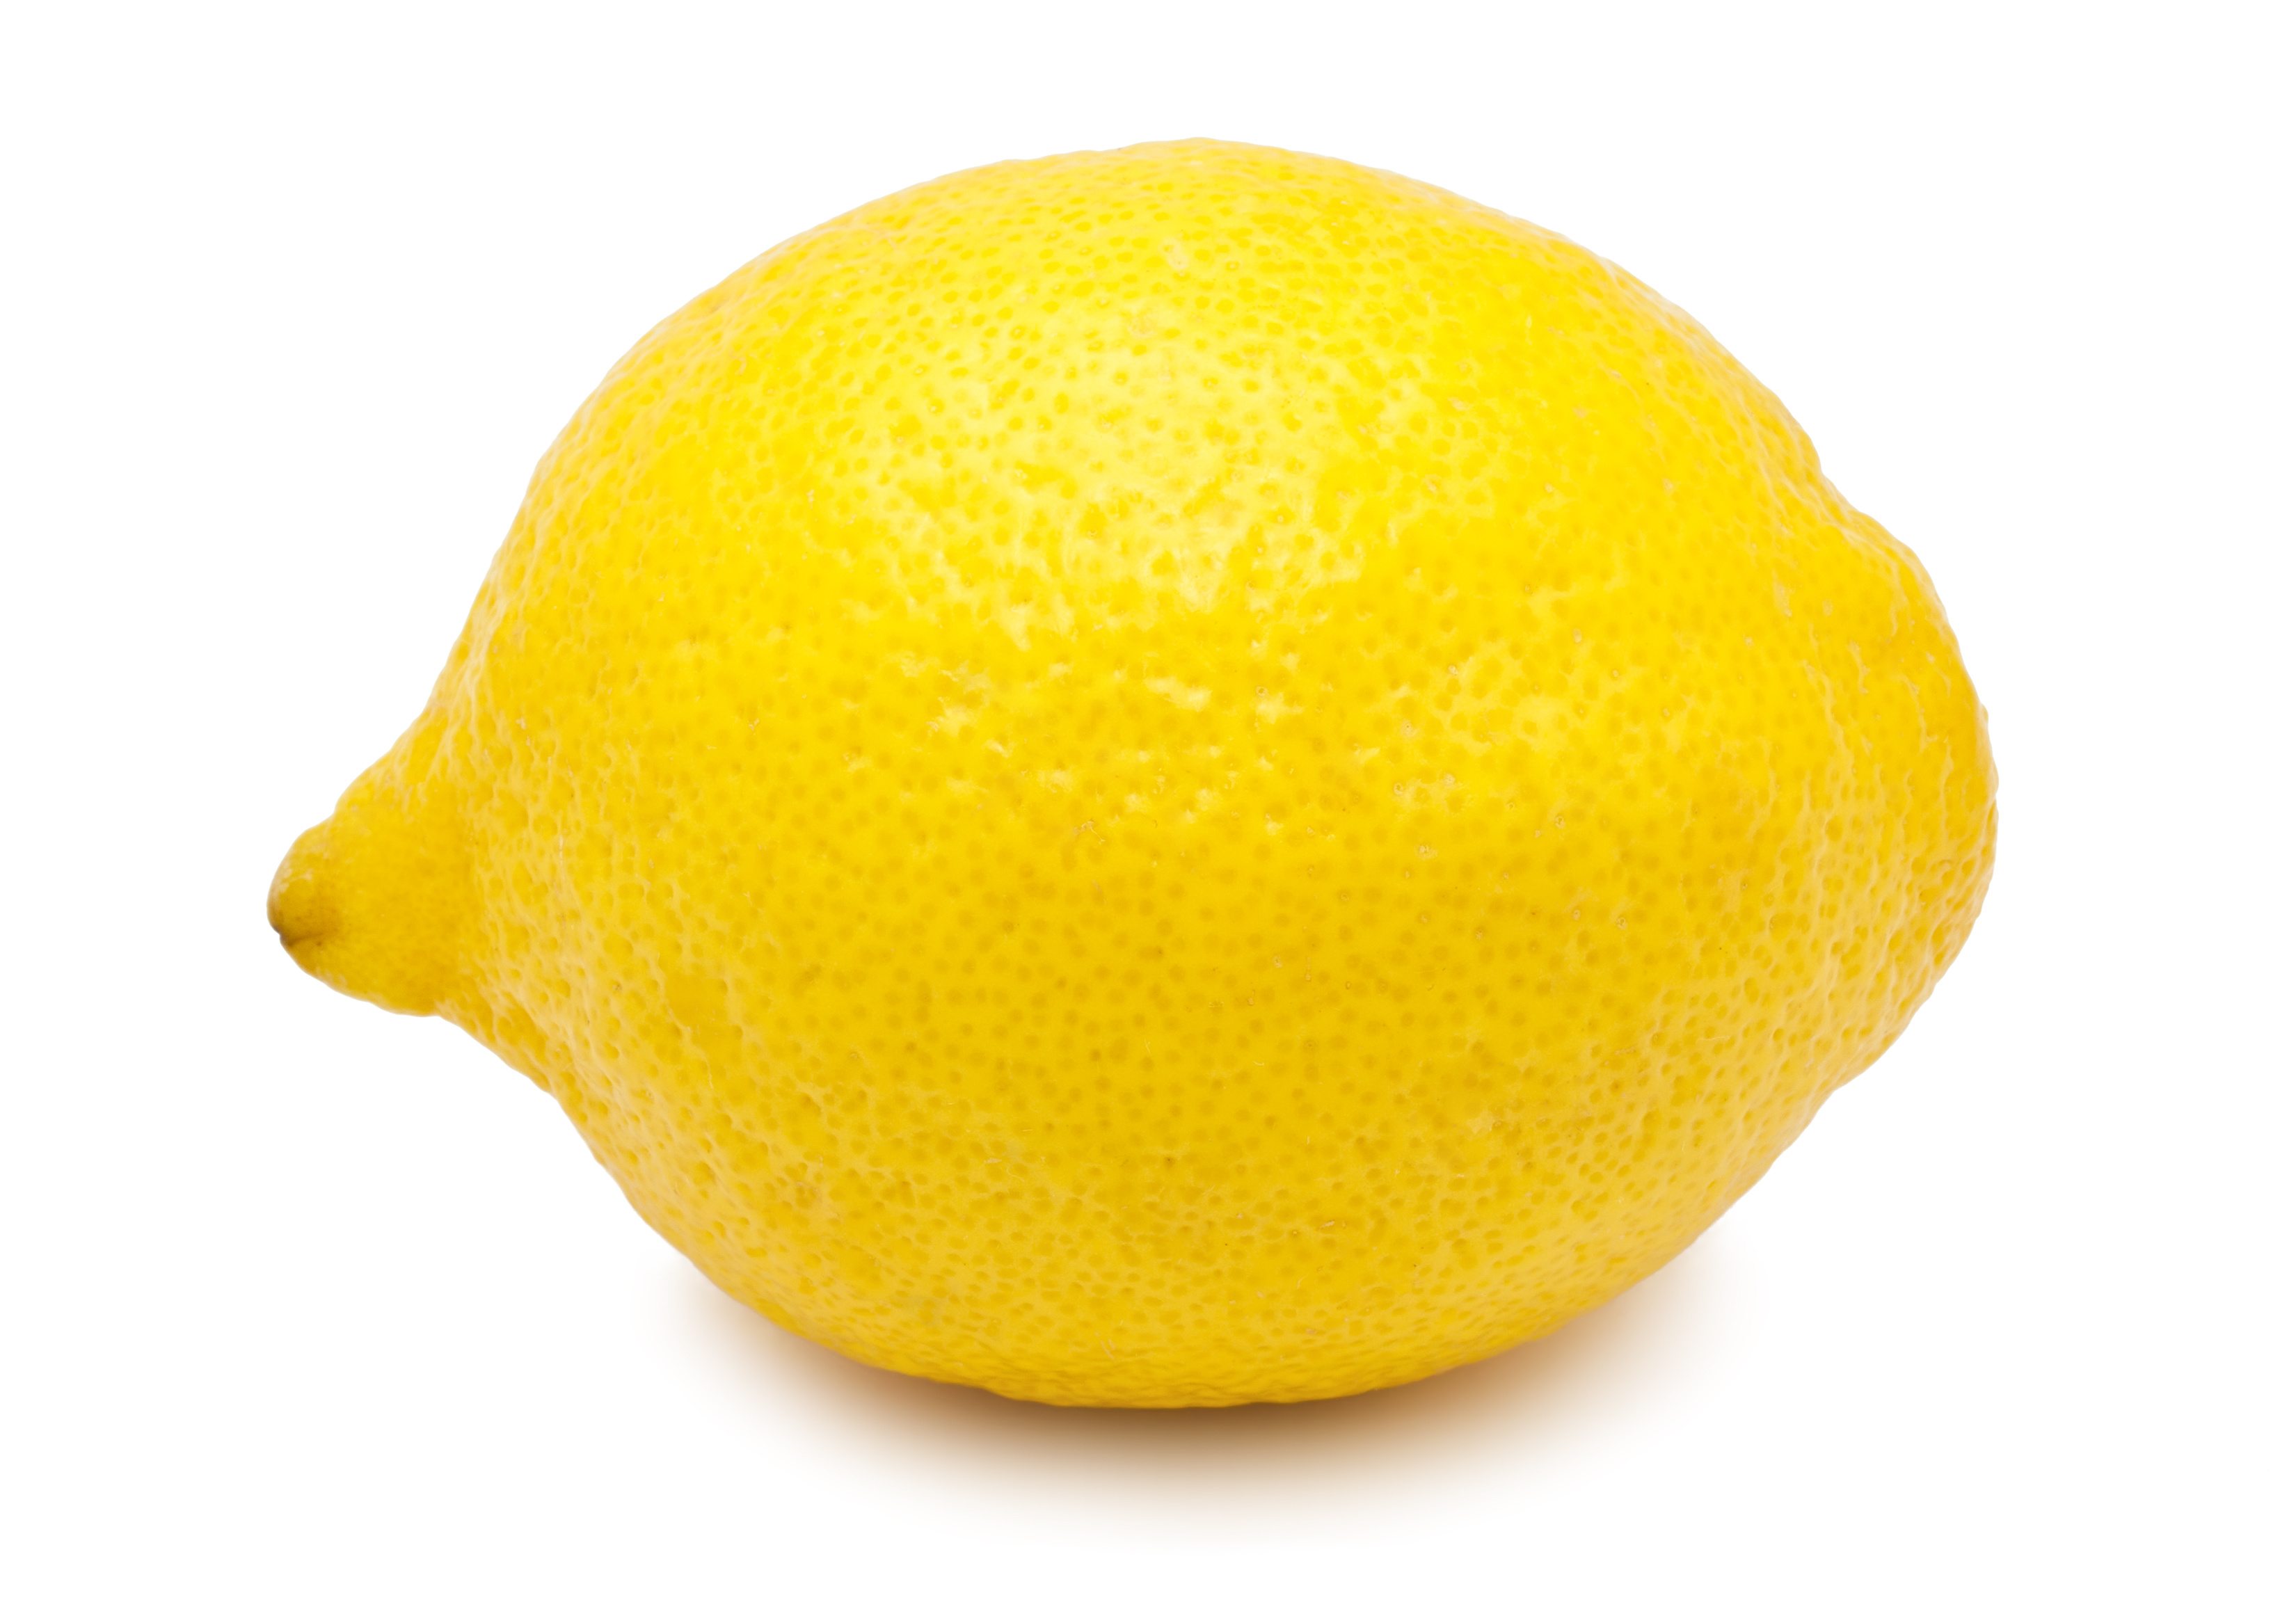 3300x2300 > Lemon Wallpapers